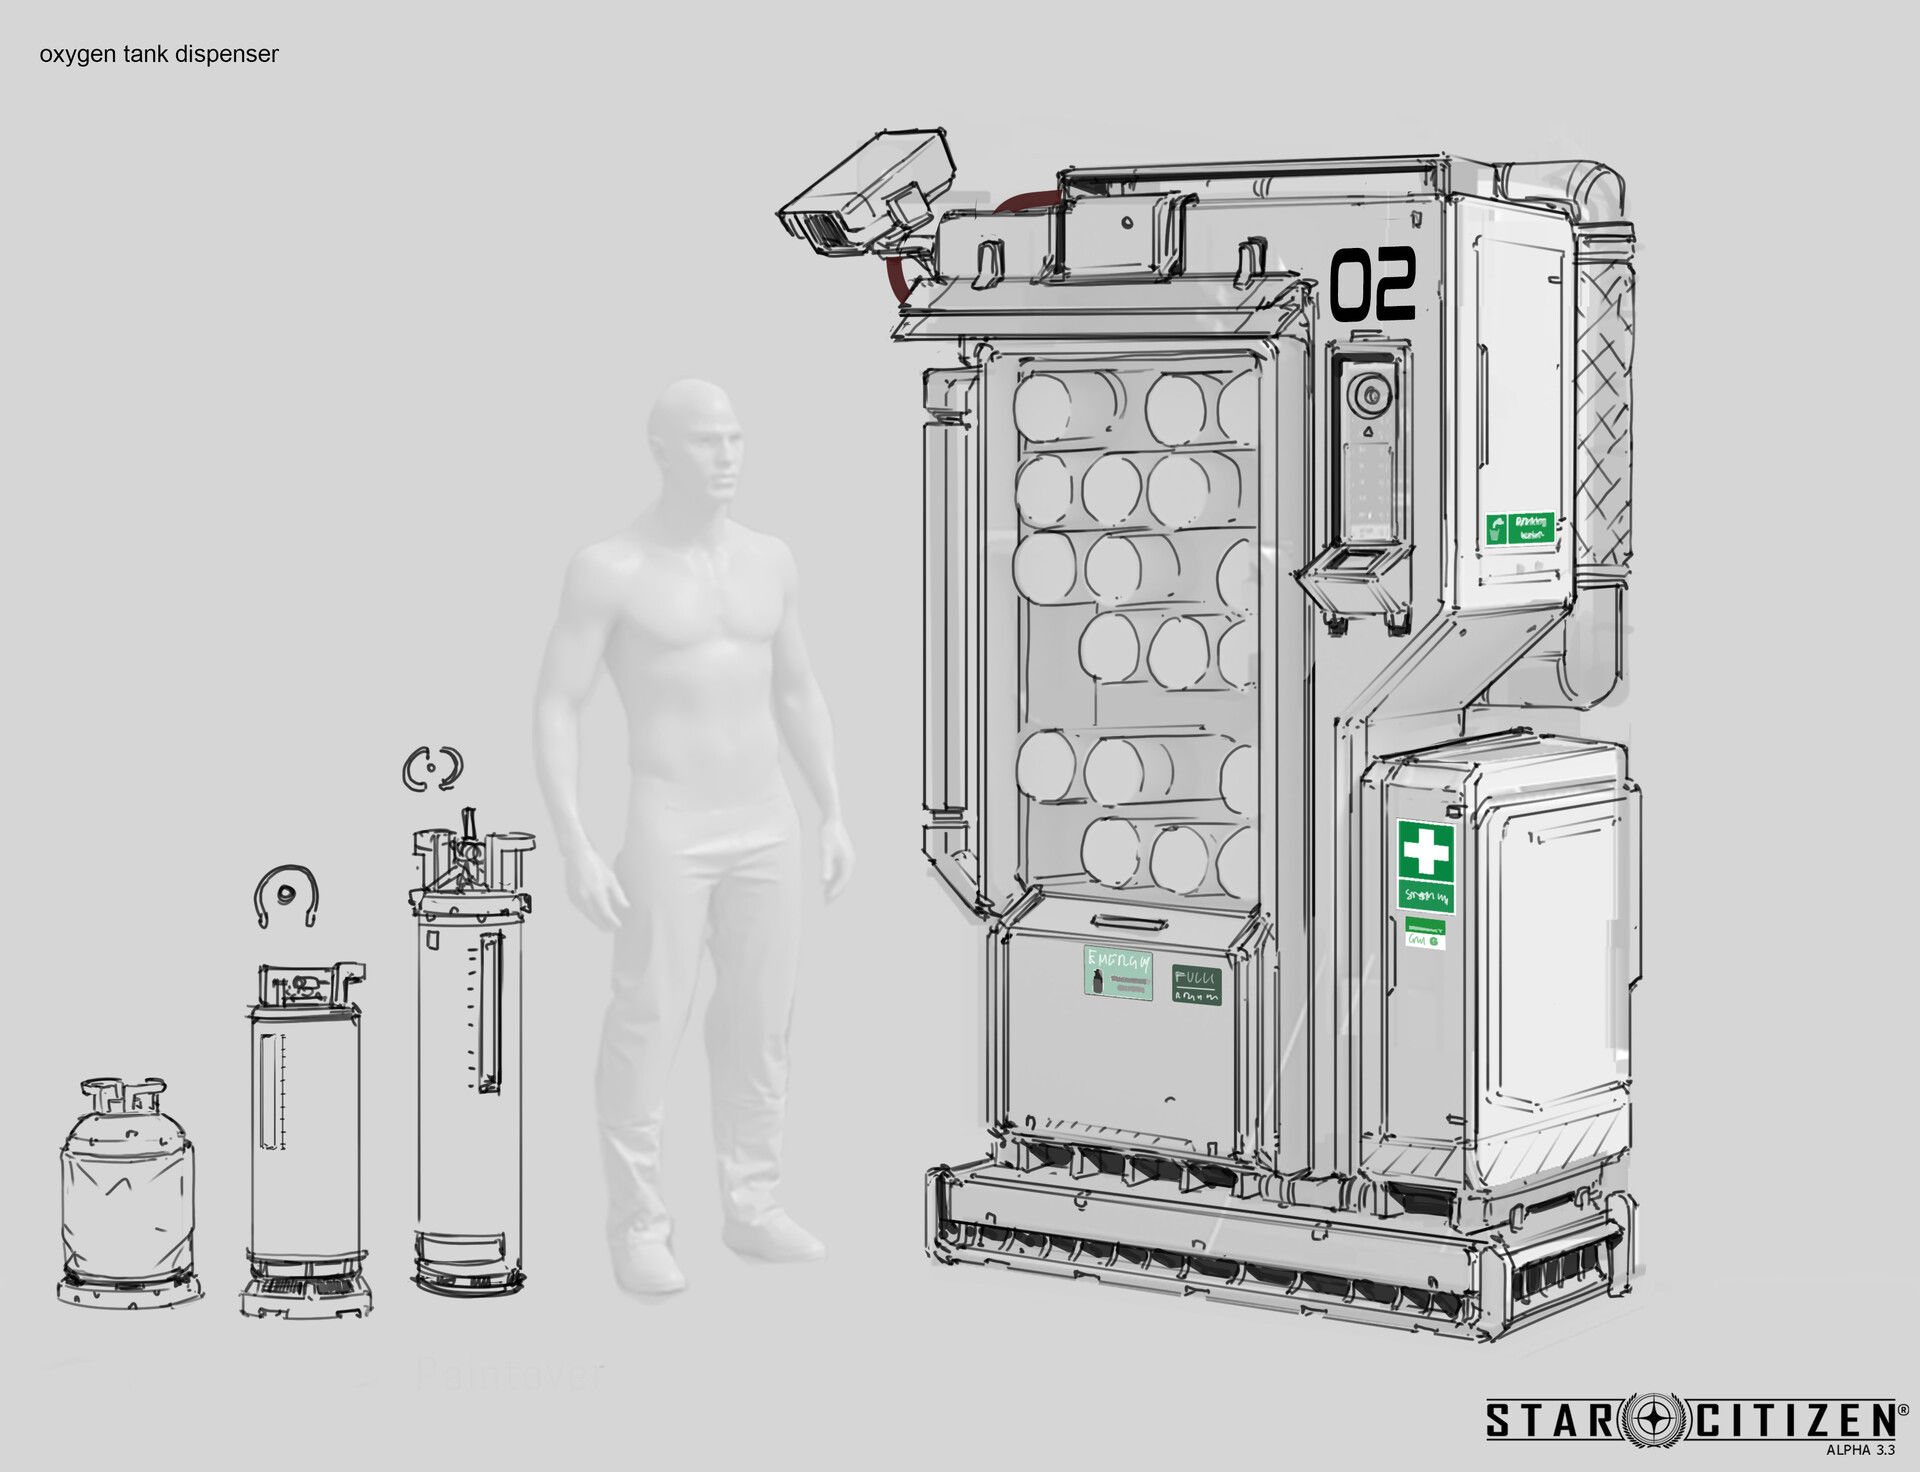 Dystrybutor pojemników z tlenem - koncept 01